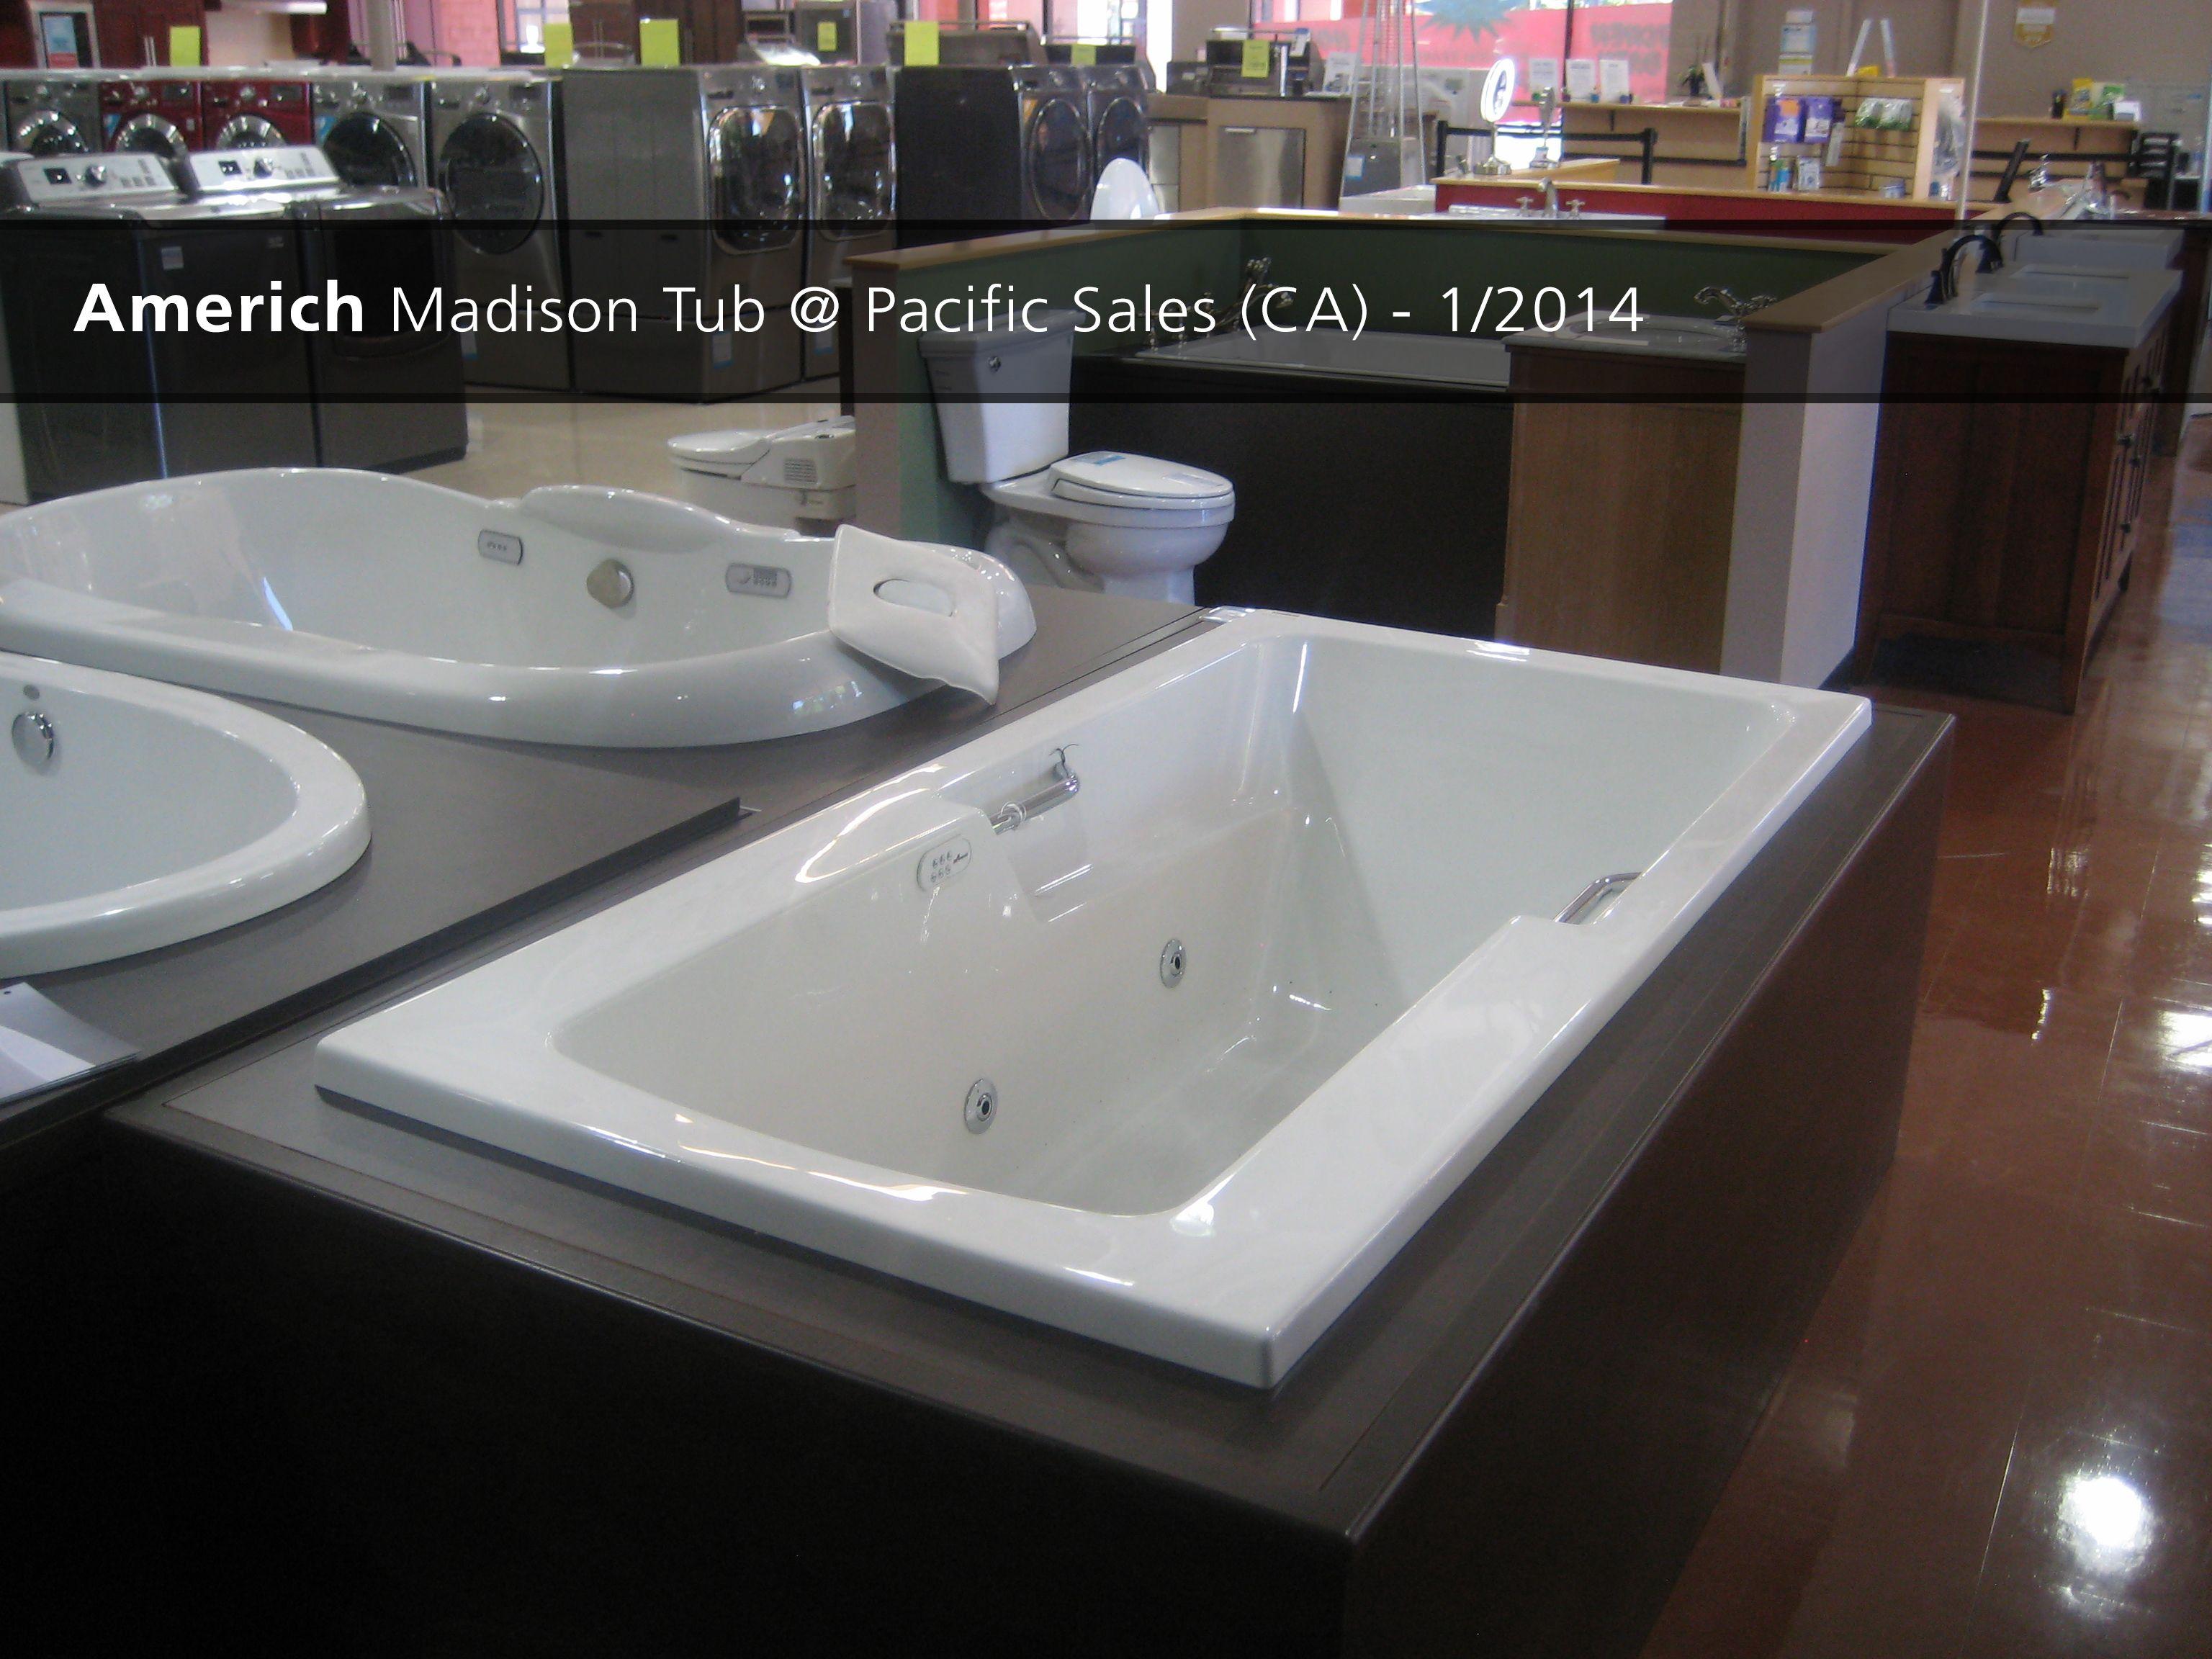 Americh Madison Tub @ Pacific Sales (CA) - 2014